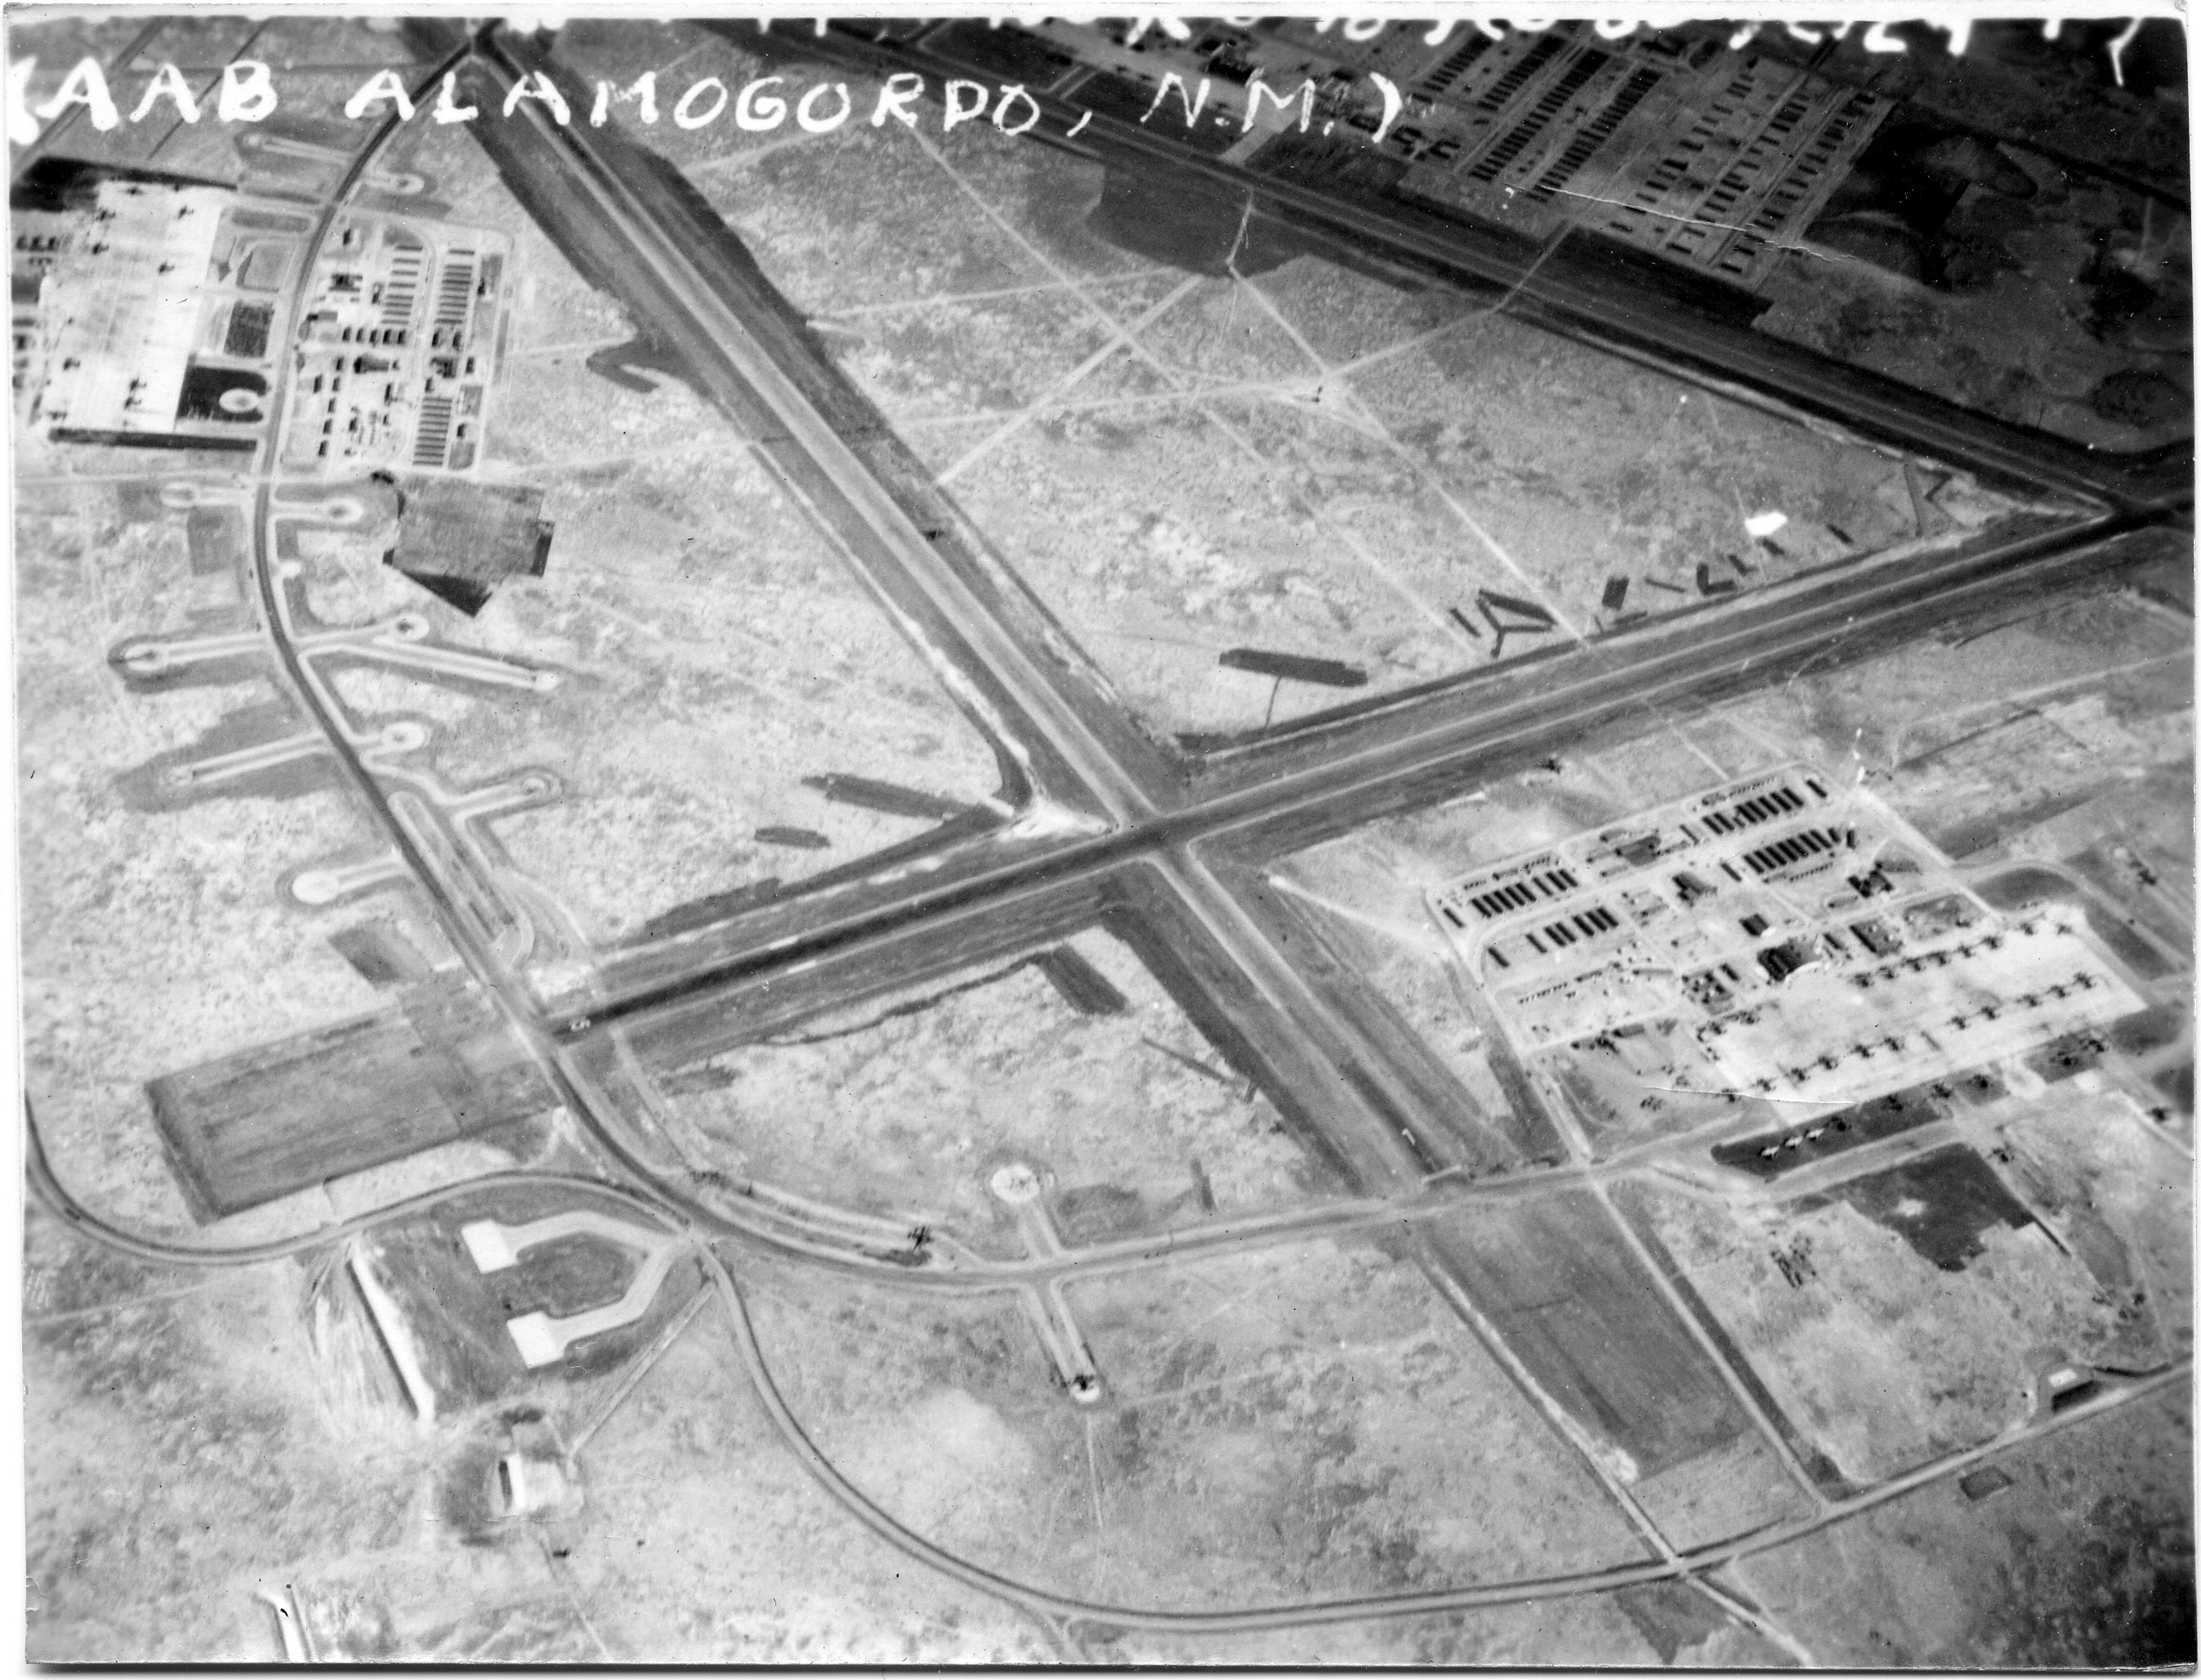 833rd aero squadron - Alamogordo Aaf 1943